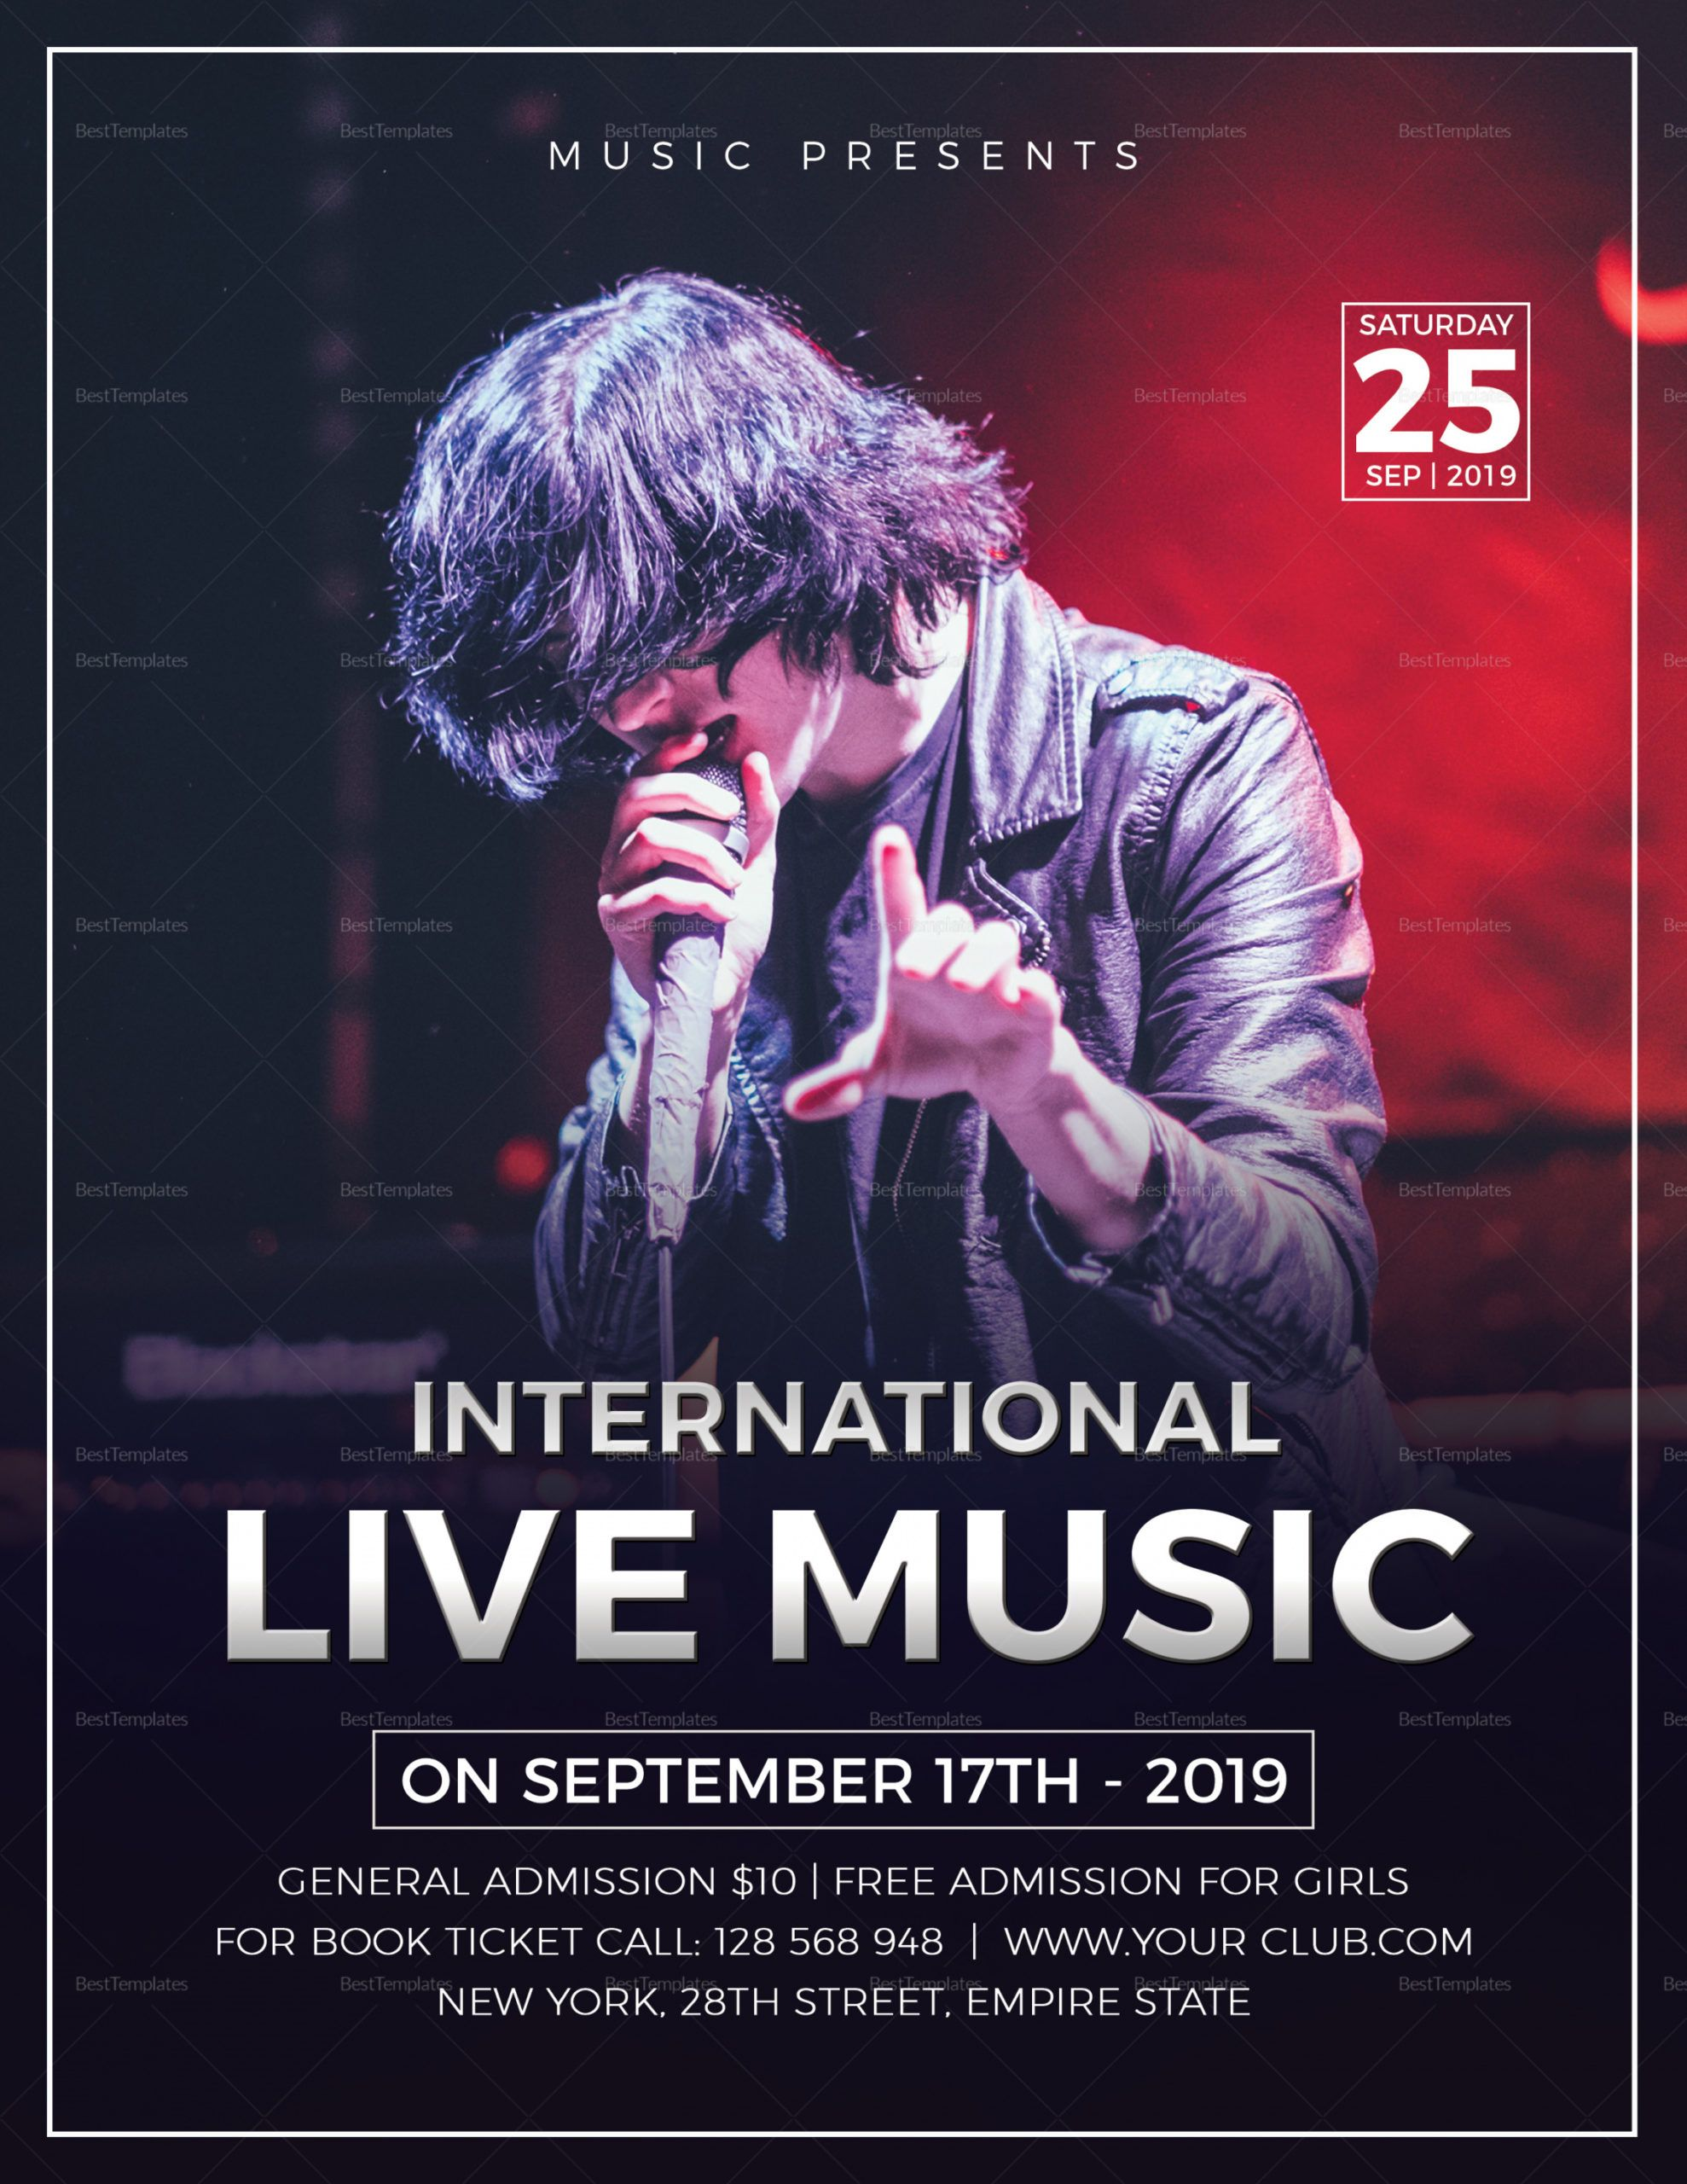 live music concert flyer design template in word psd publisher live music flyer template doc